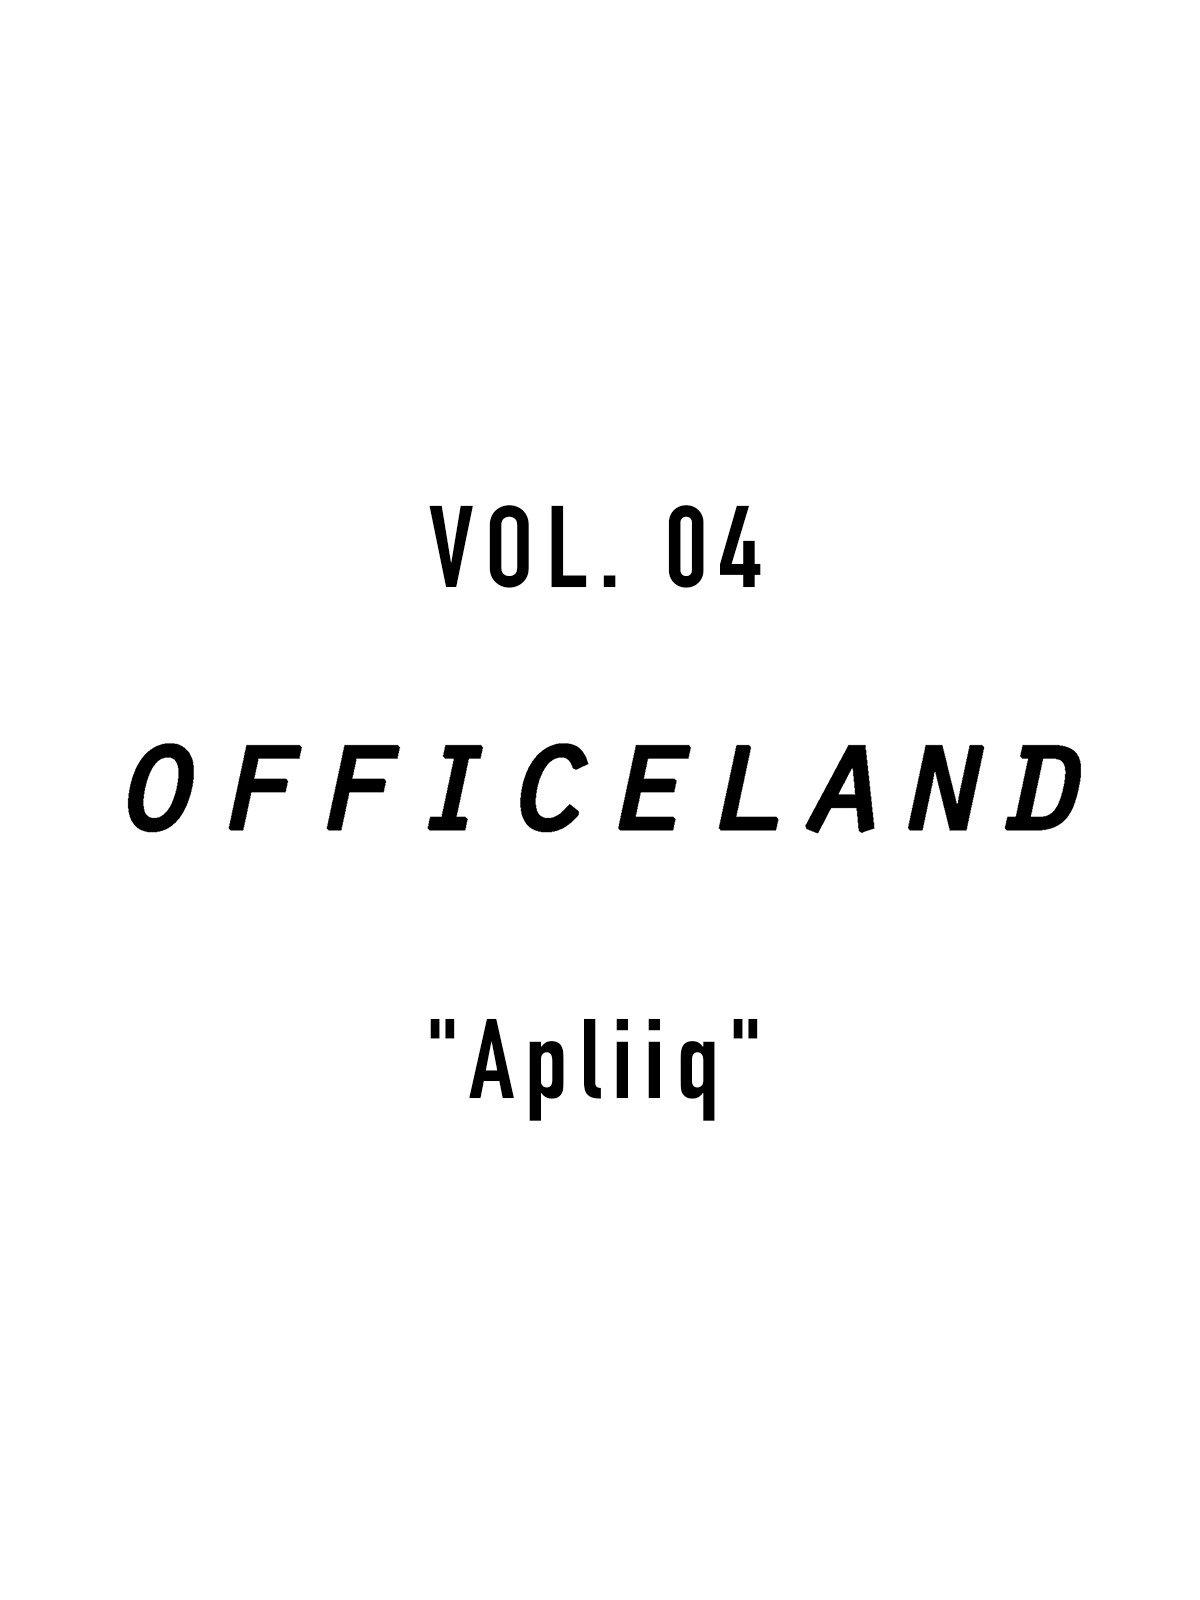 Officeland Vol. 04